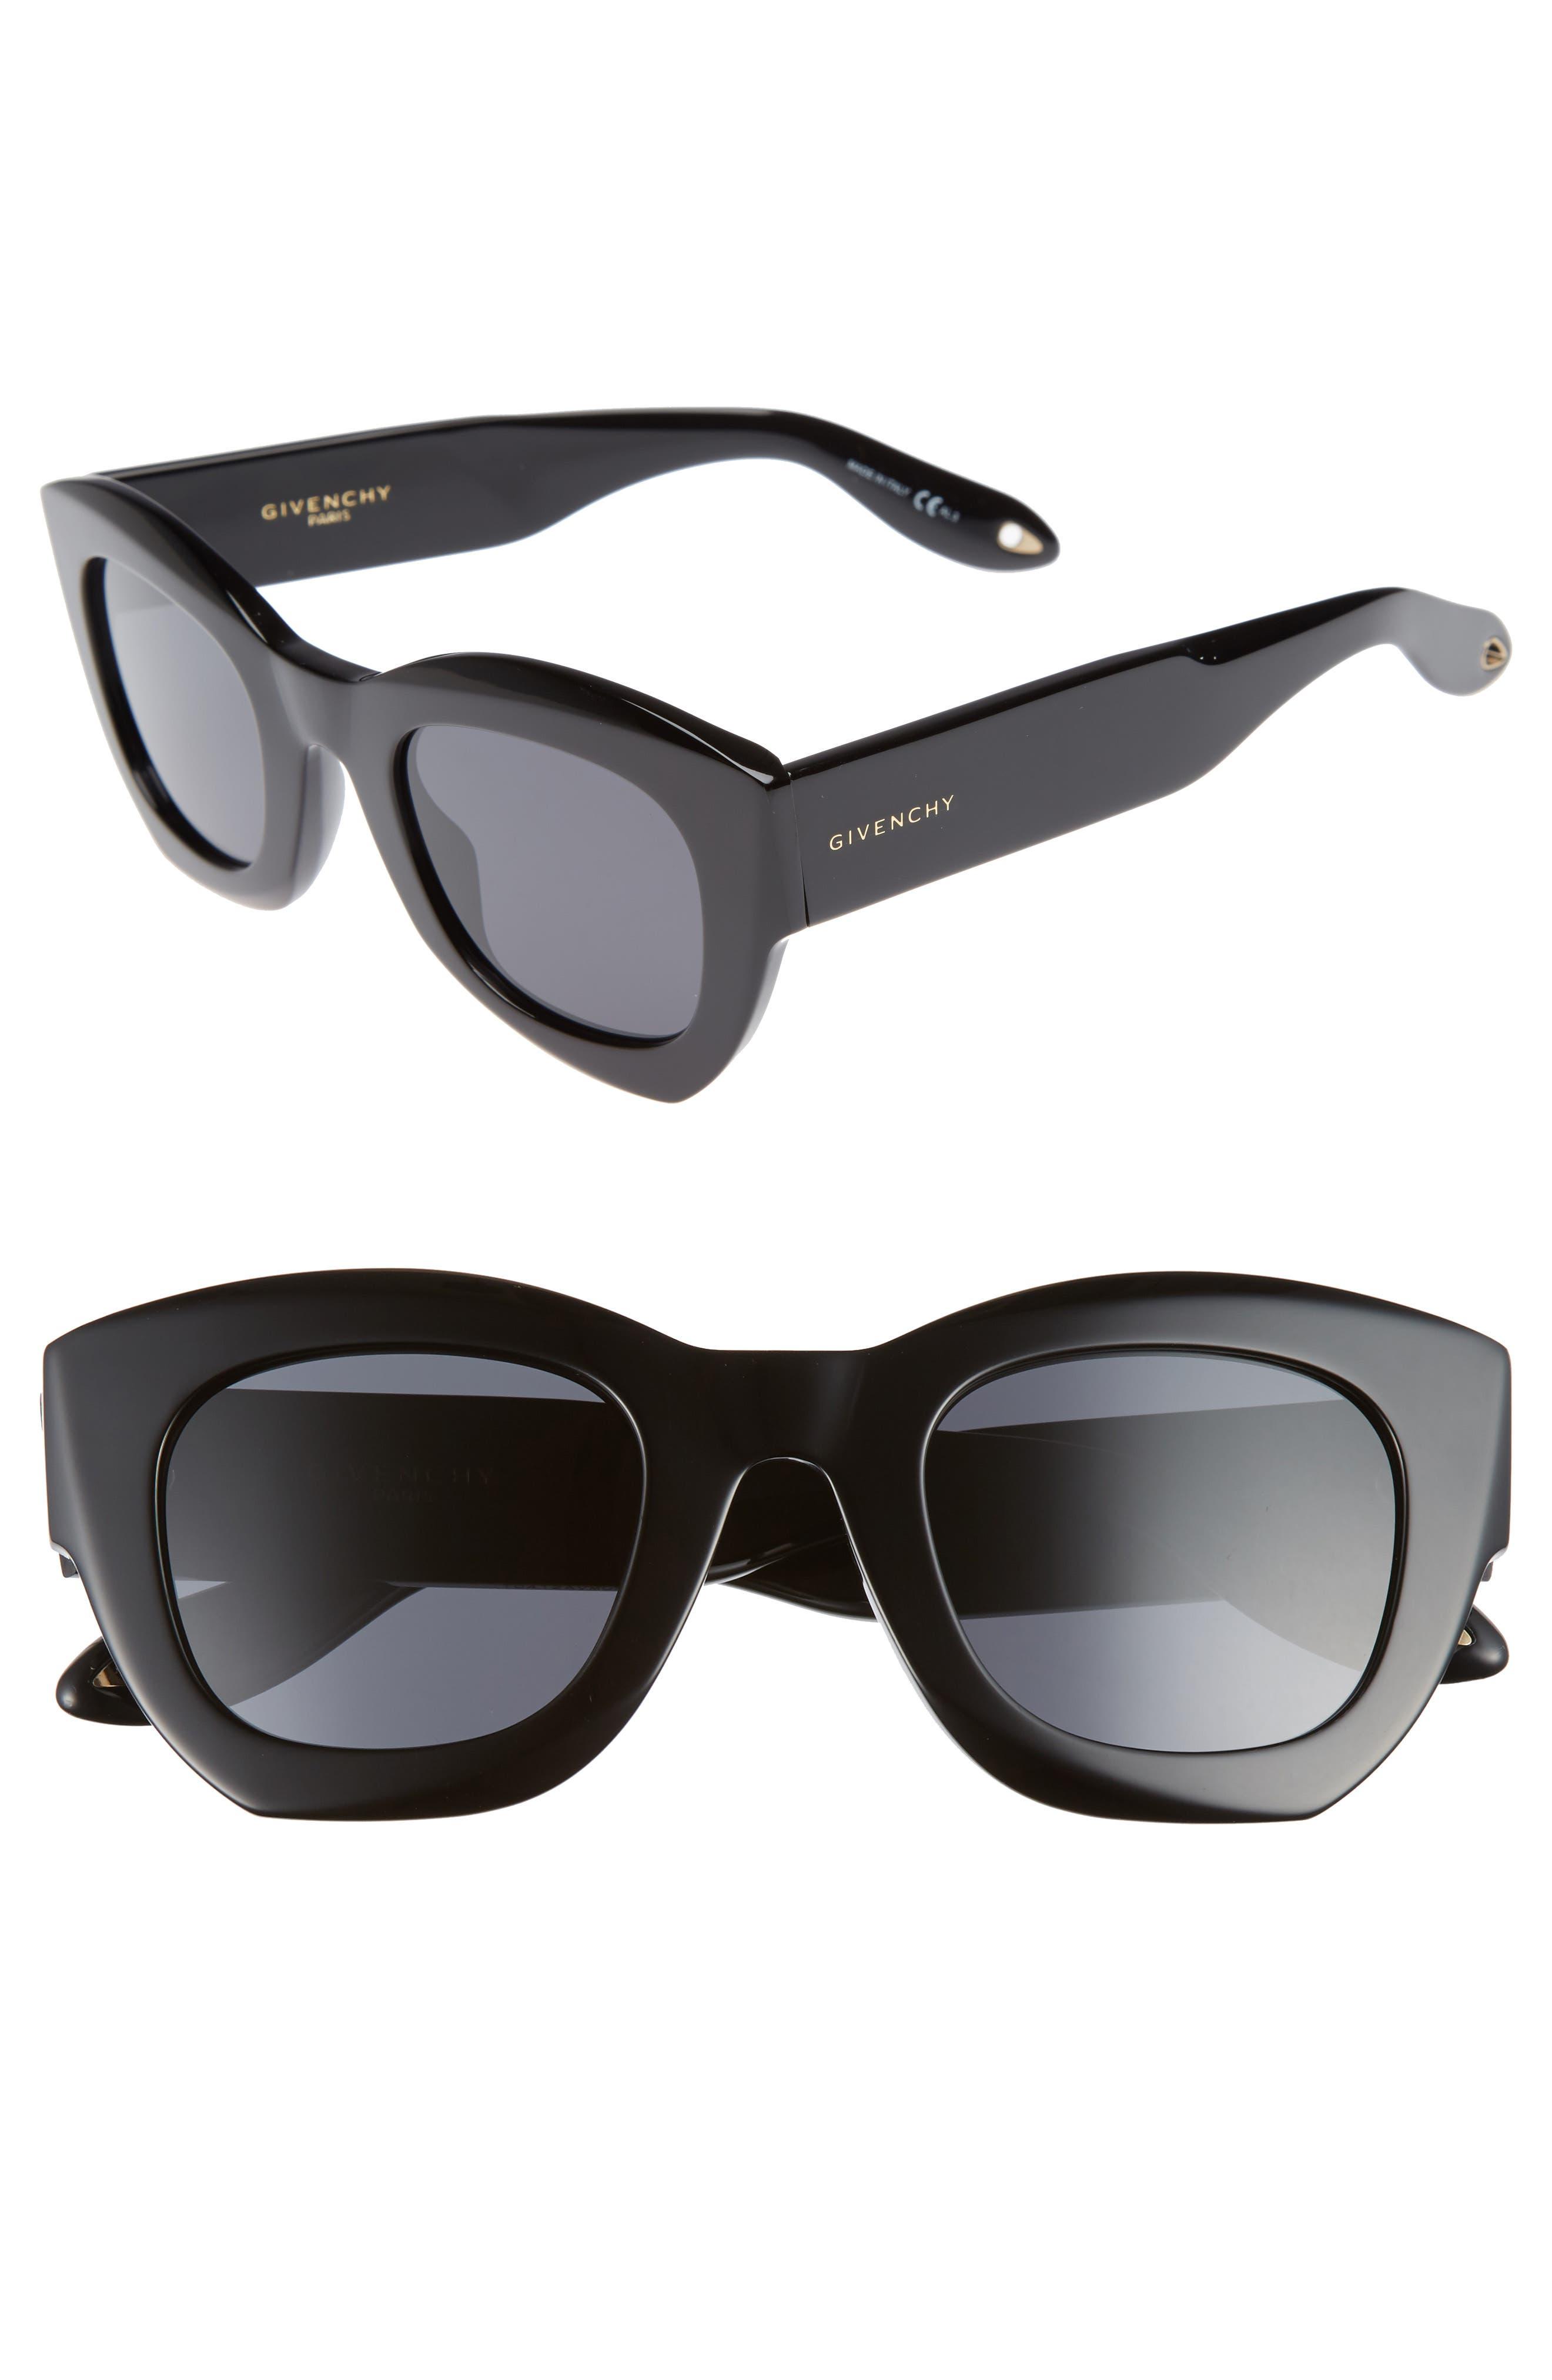 48mm Cat Eye Sunglasses,                         Main,                         color, 001